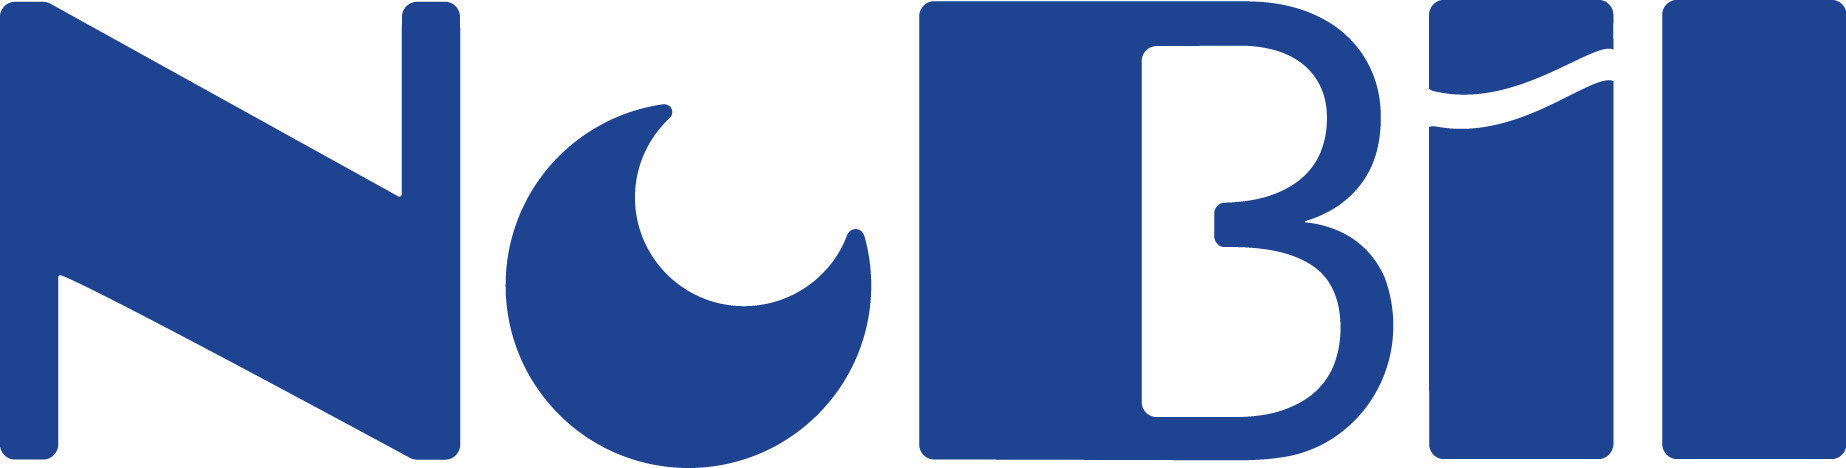 nobil-logo